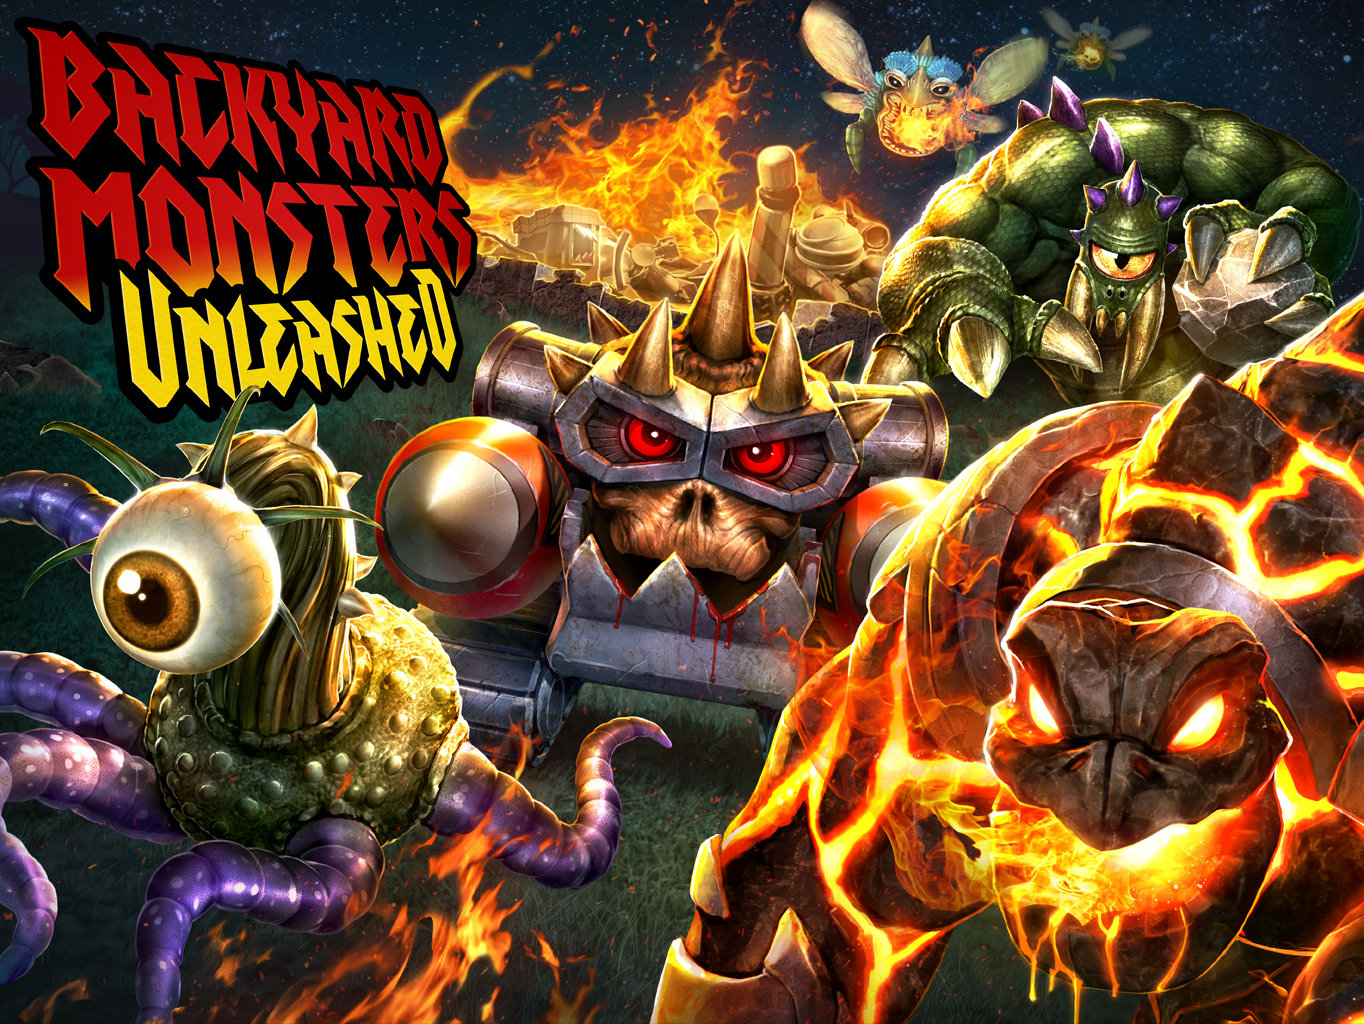 Backyard Monsters Unleashed Key Art